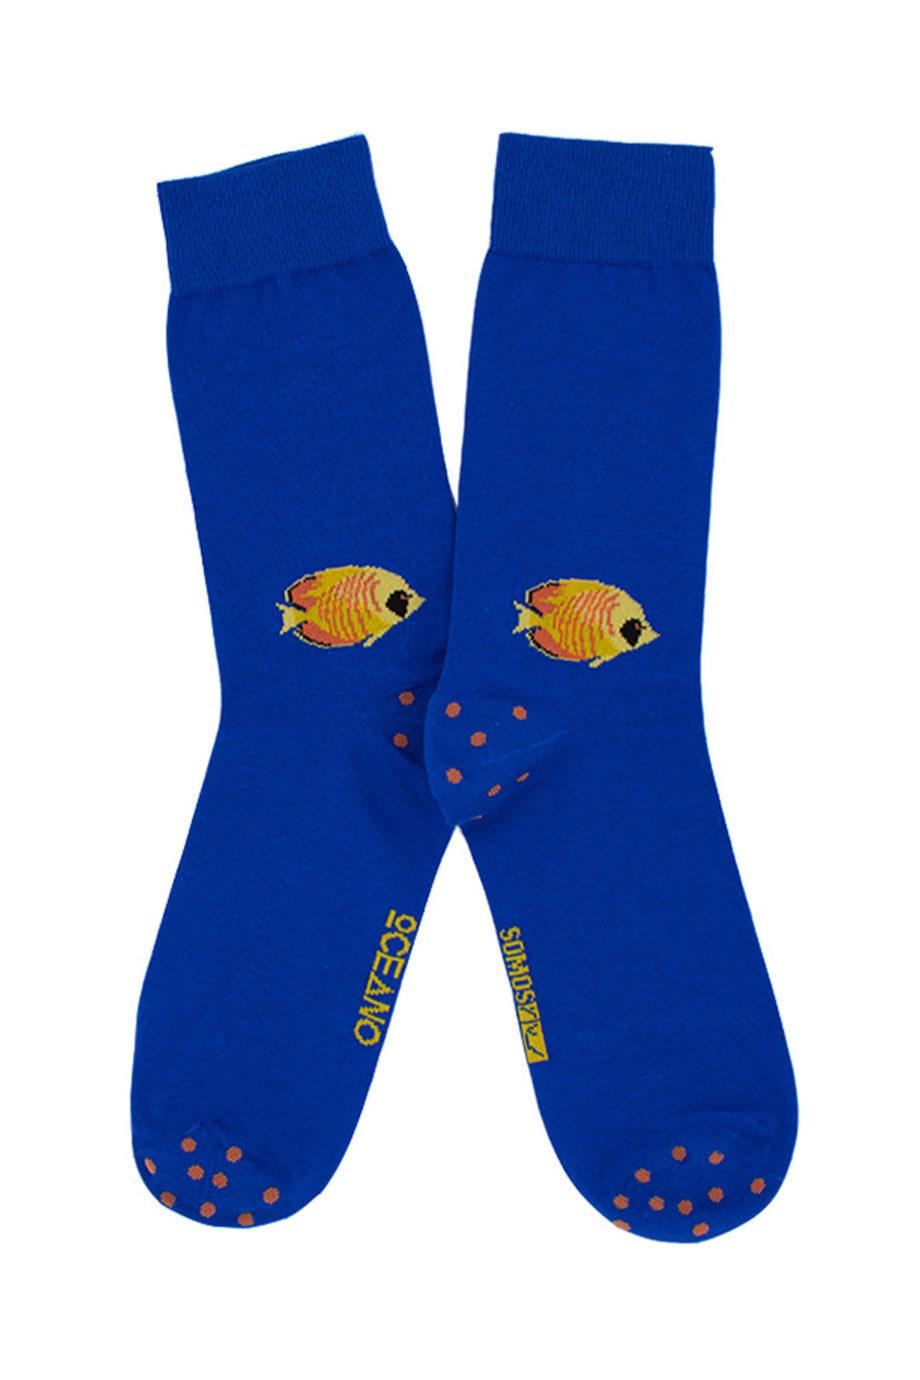 somosoceano-calcetines-pez-tropical